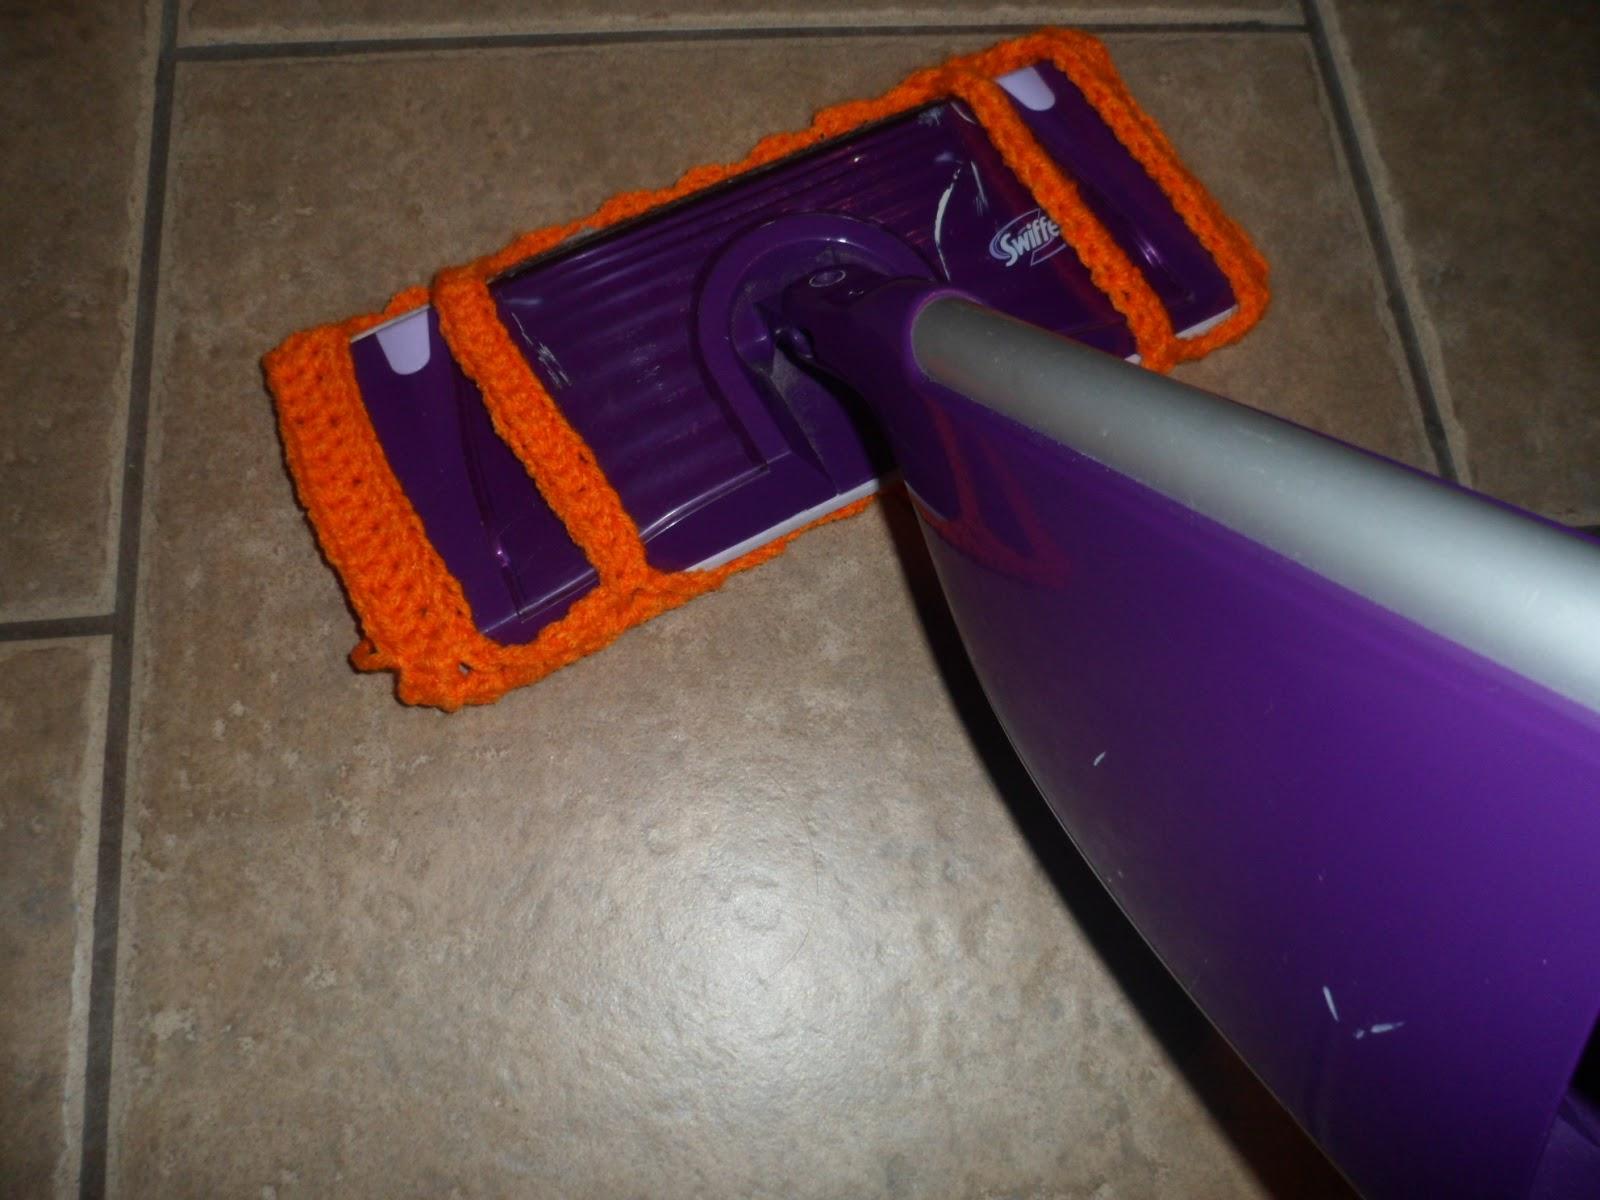 My Heart Vine Crochet Make Your Own Reusable Swiffer Wet Jet Mop